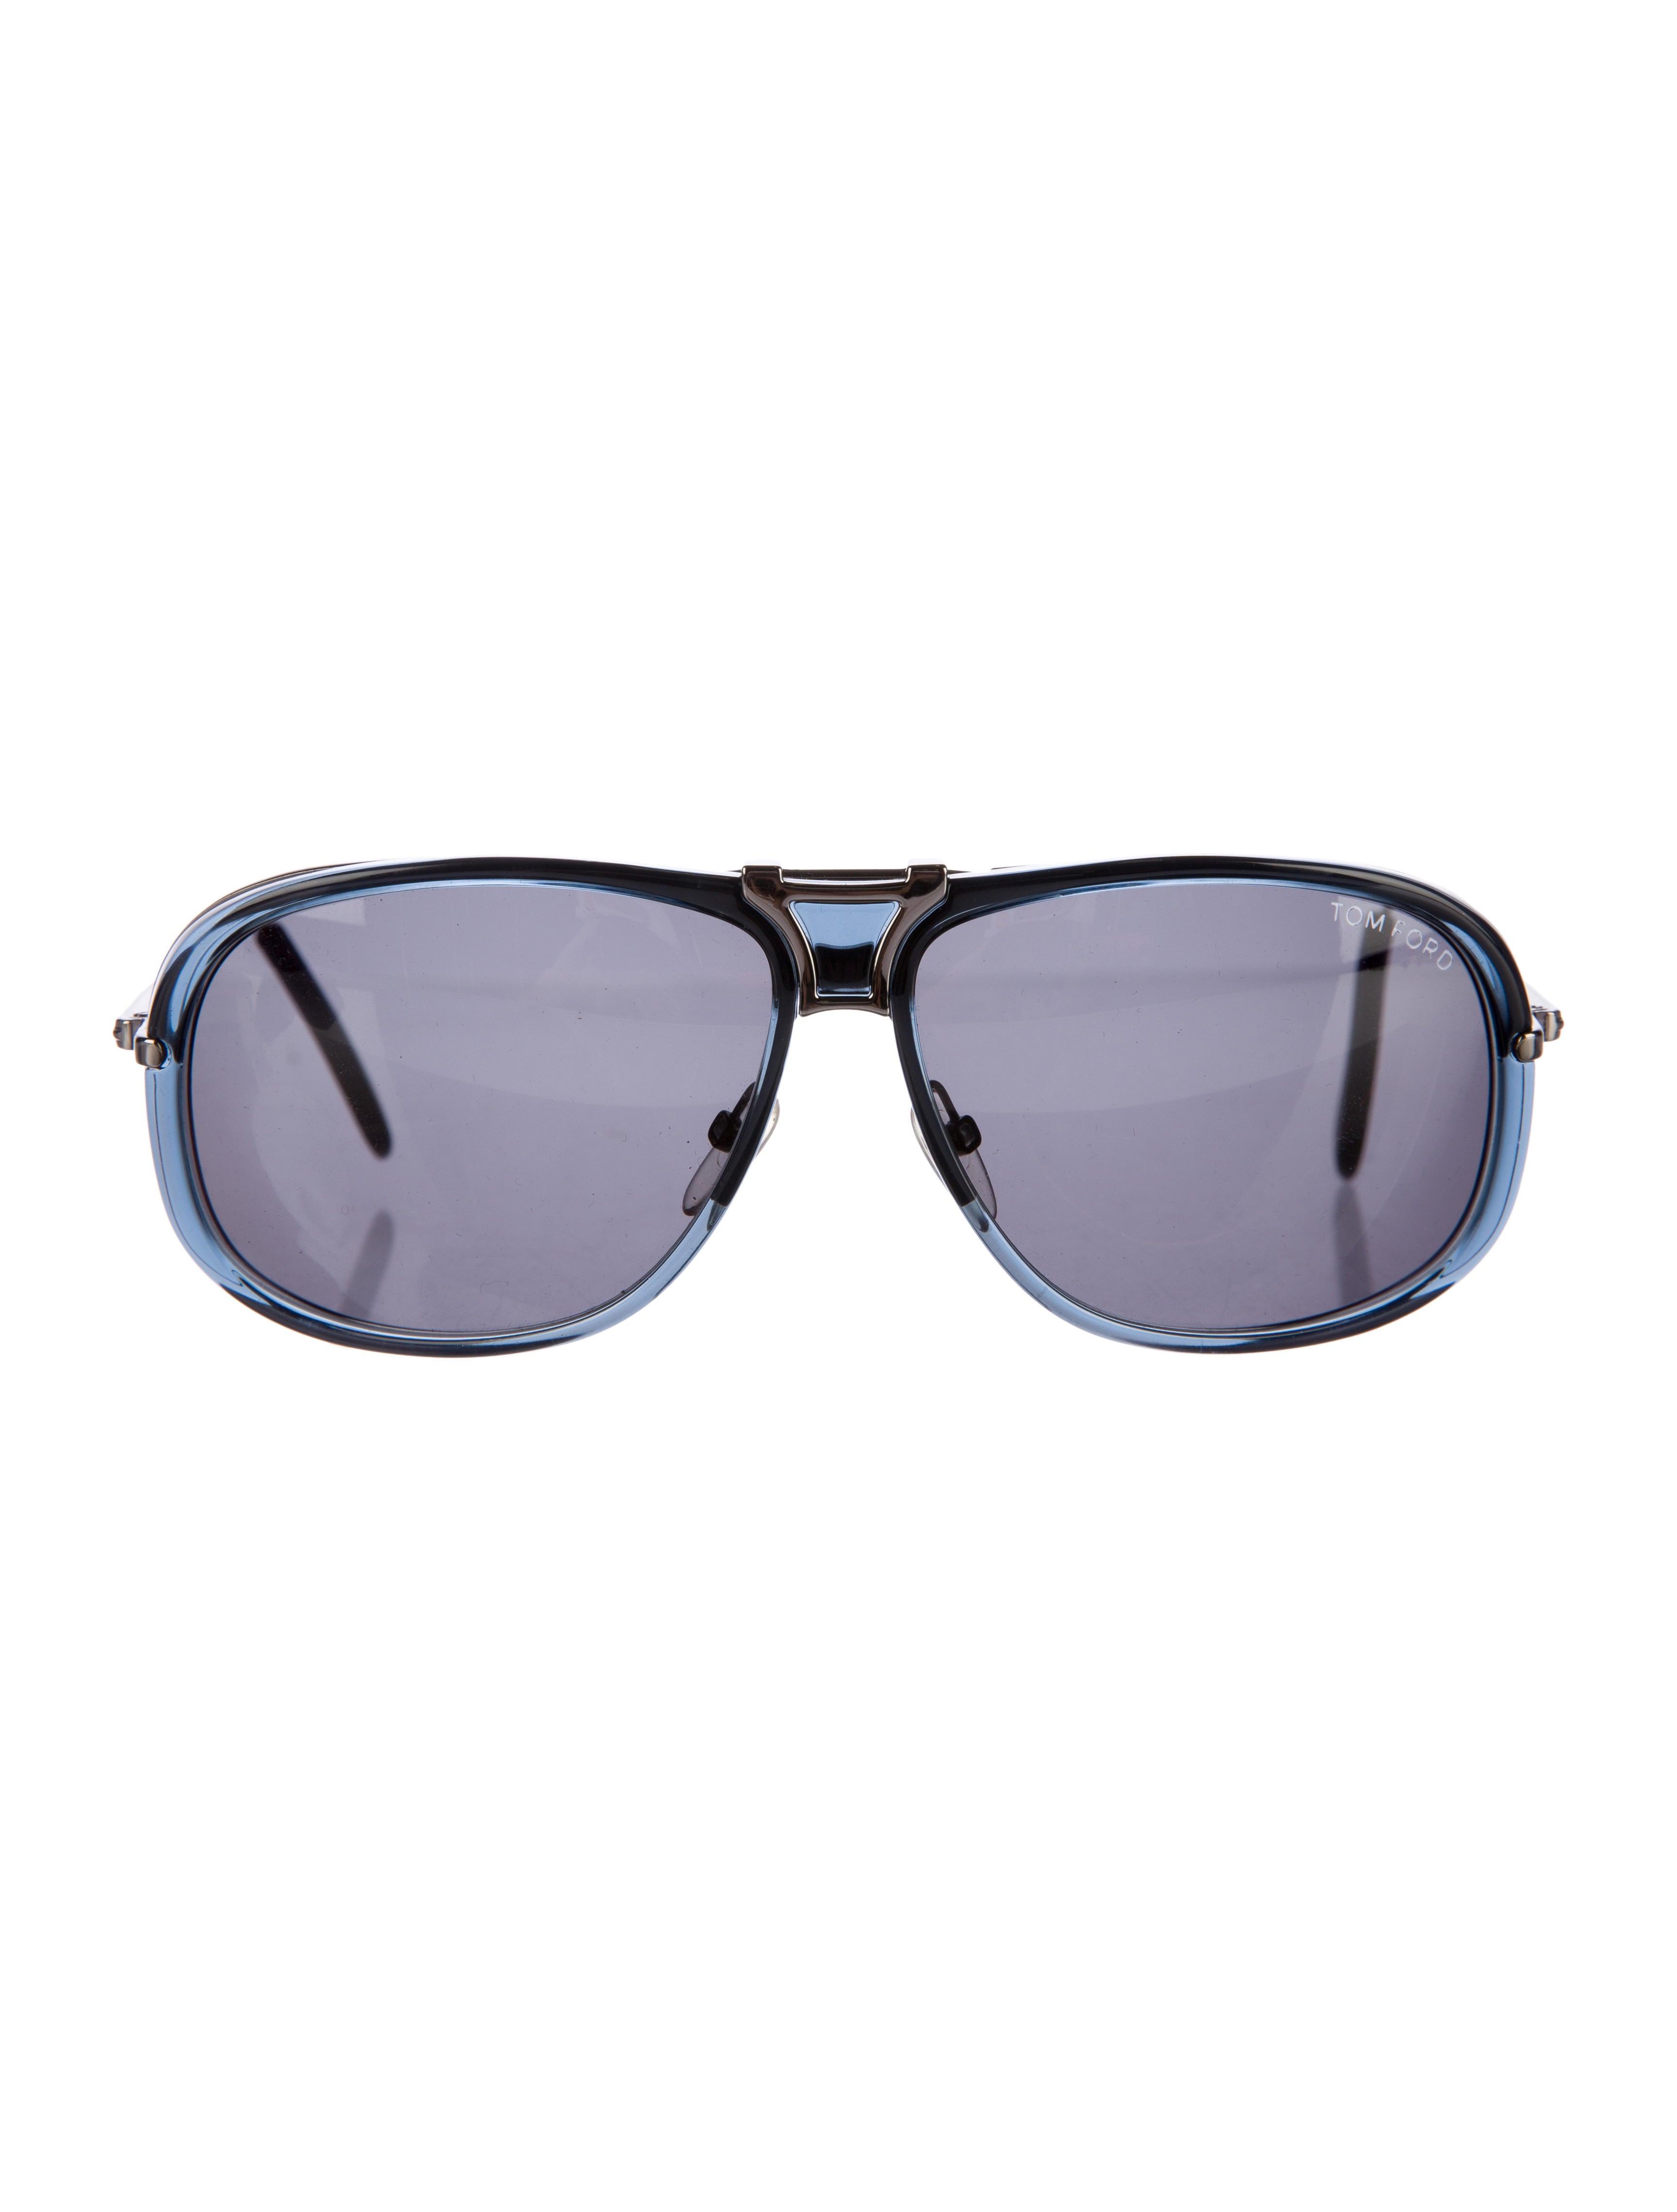 10ec06d8f422 Tom Ford Robbie Aviator Sunglasses - Accessories - TOM33892